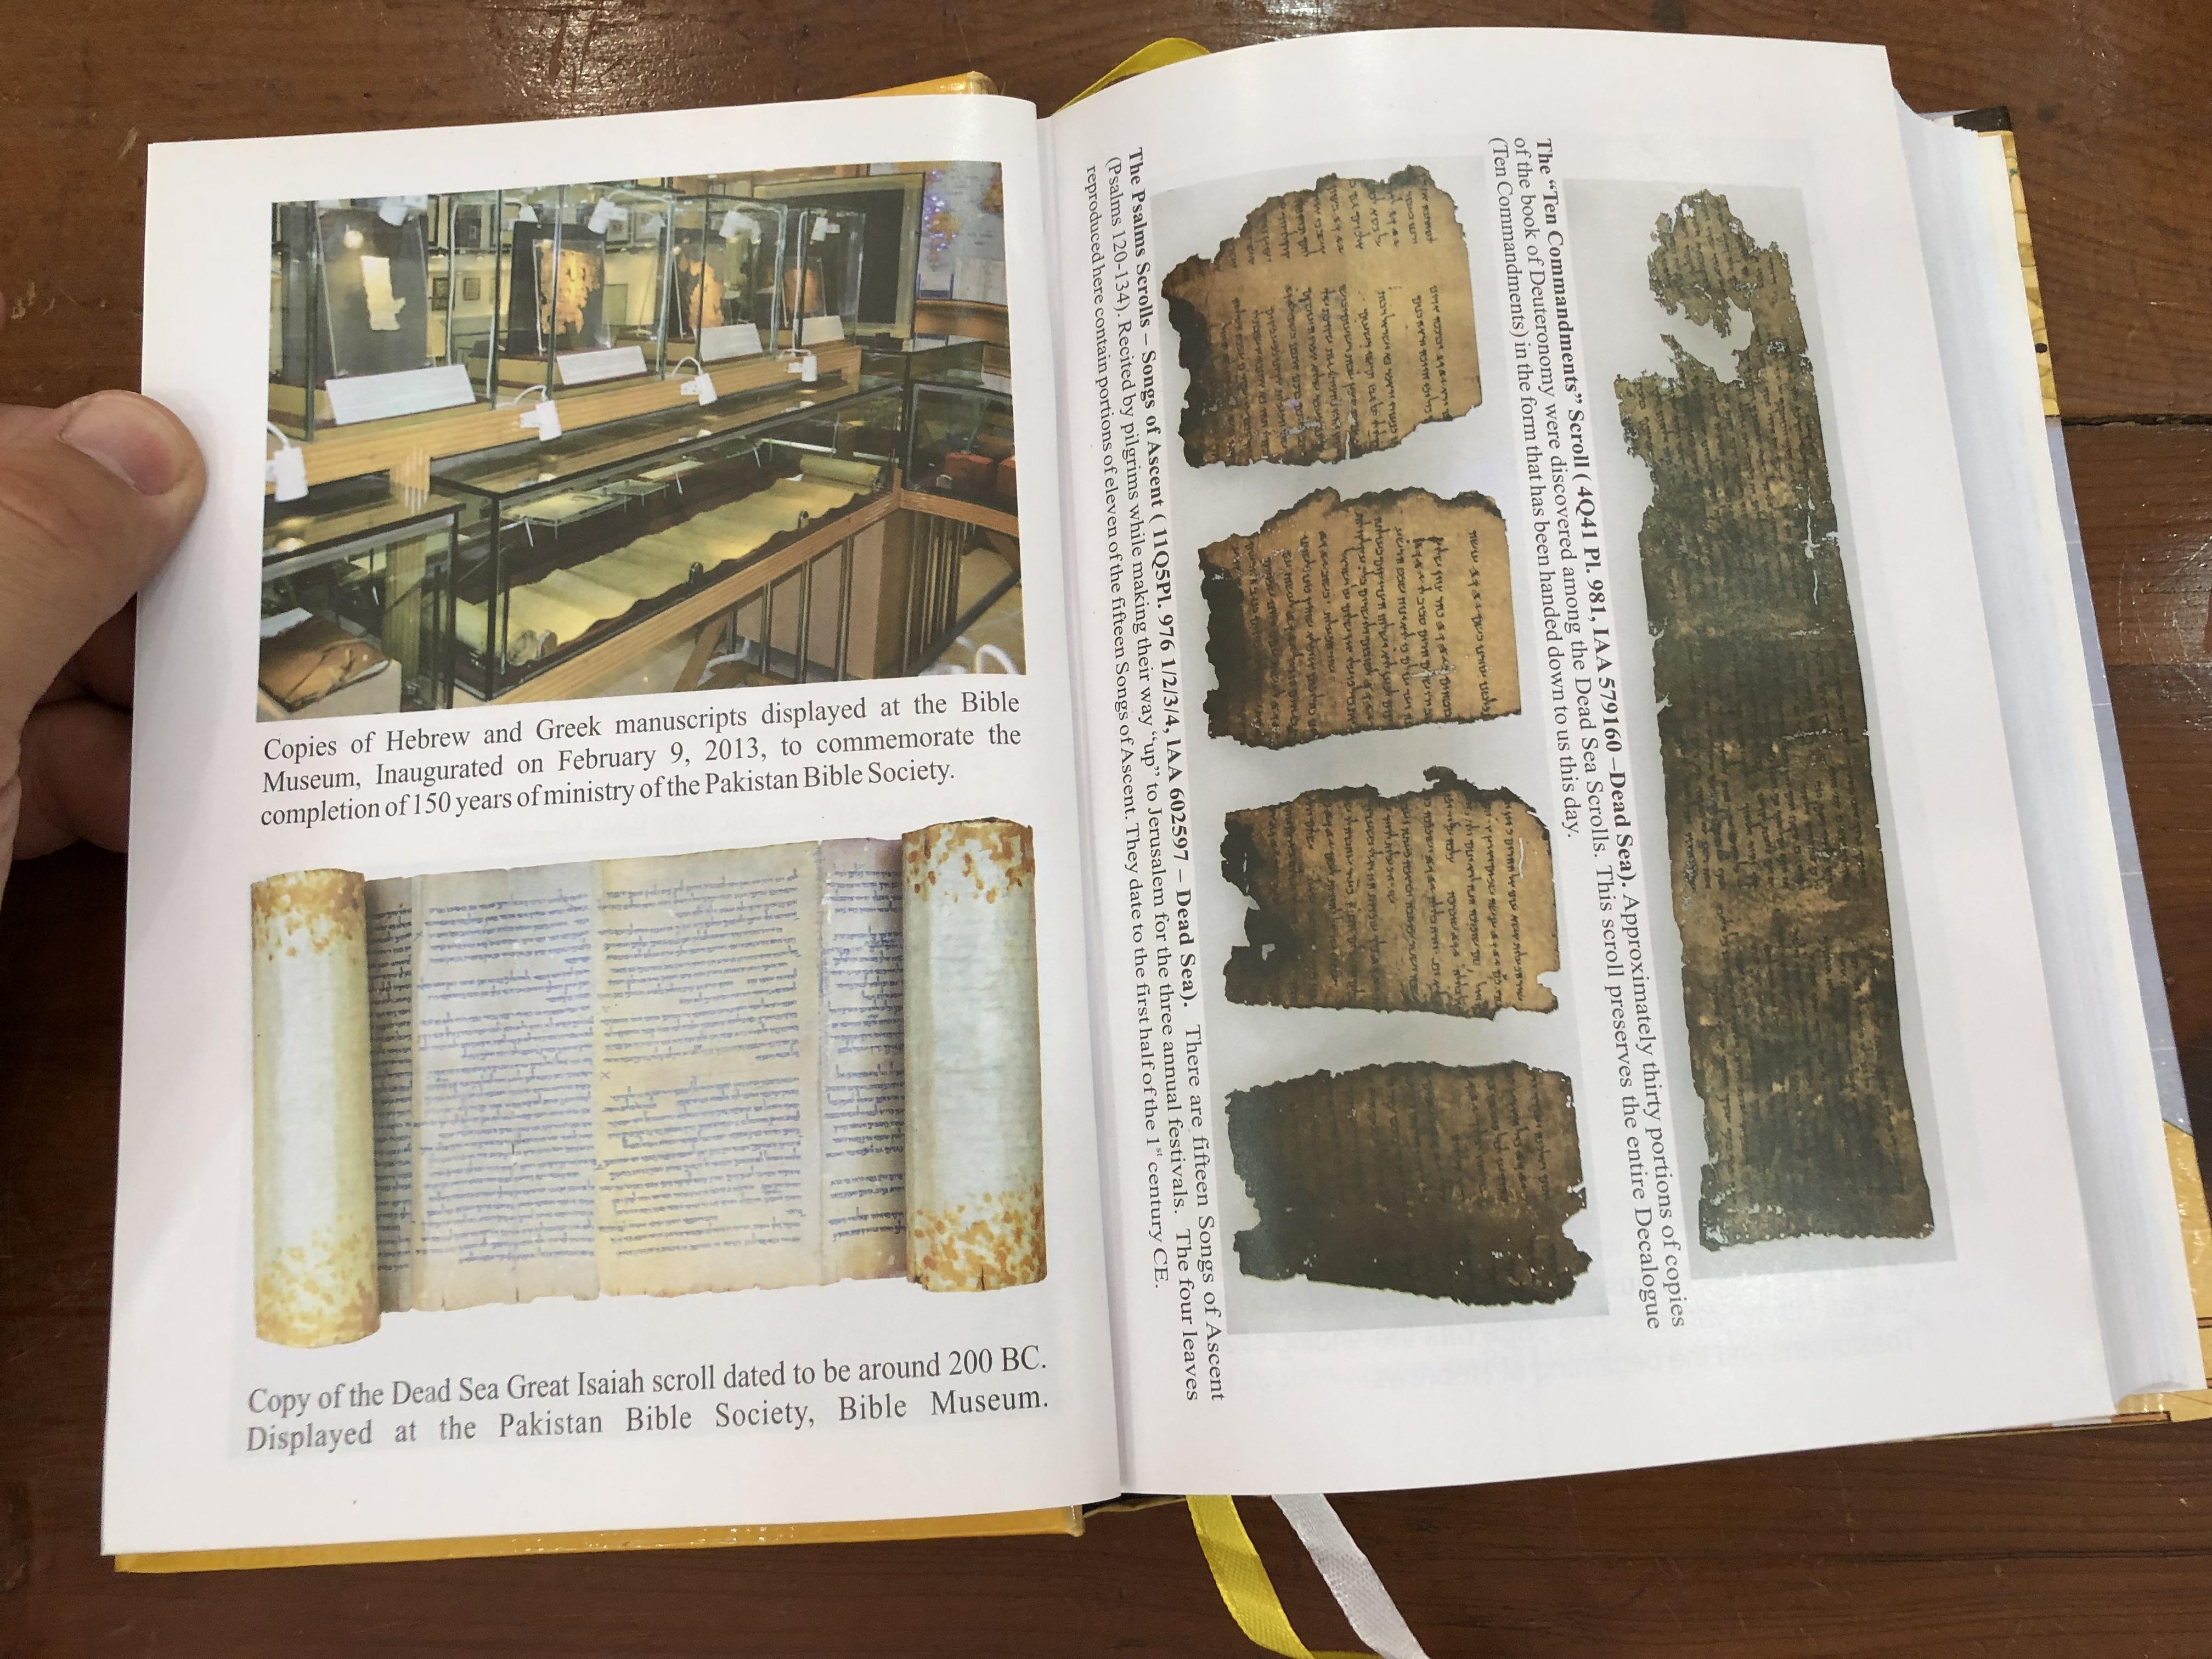 discover-the-bible-in-urdu-language-motdaba-kalam-e-muqadds-hardcover-2013-pakistan-bible-society-18-.jpg